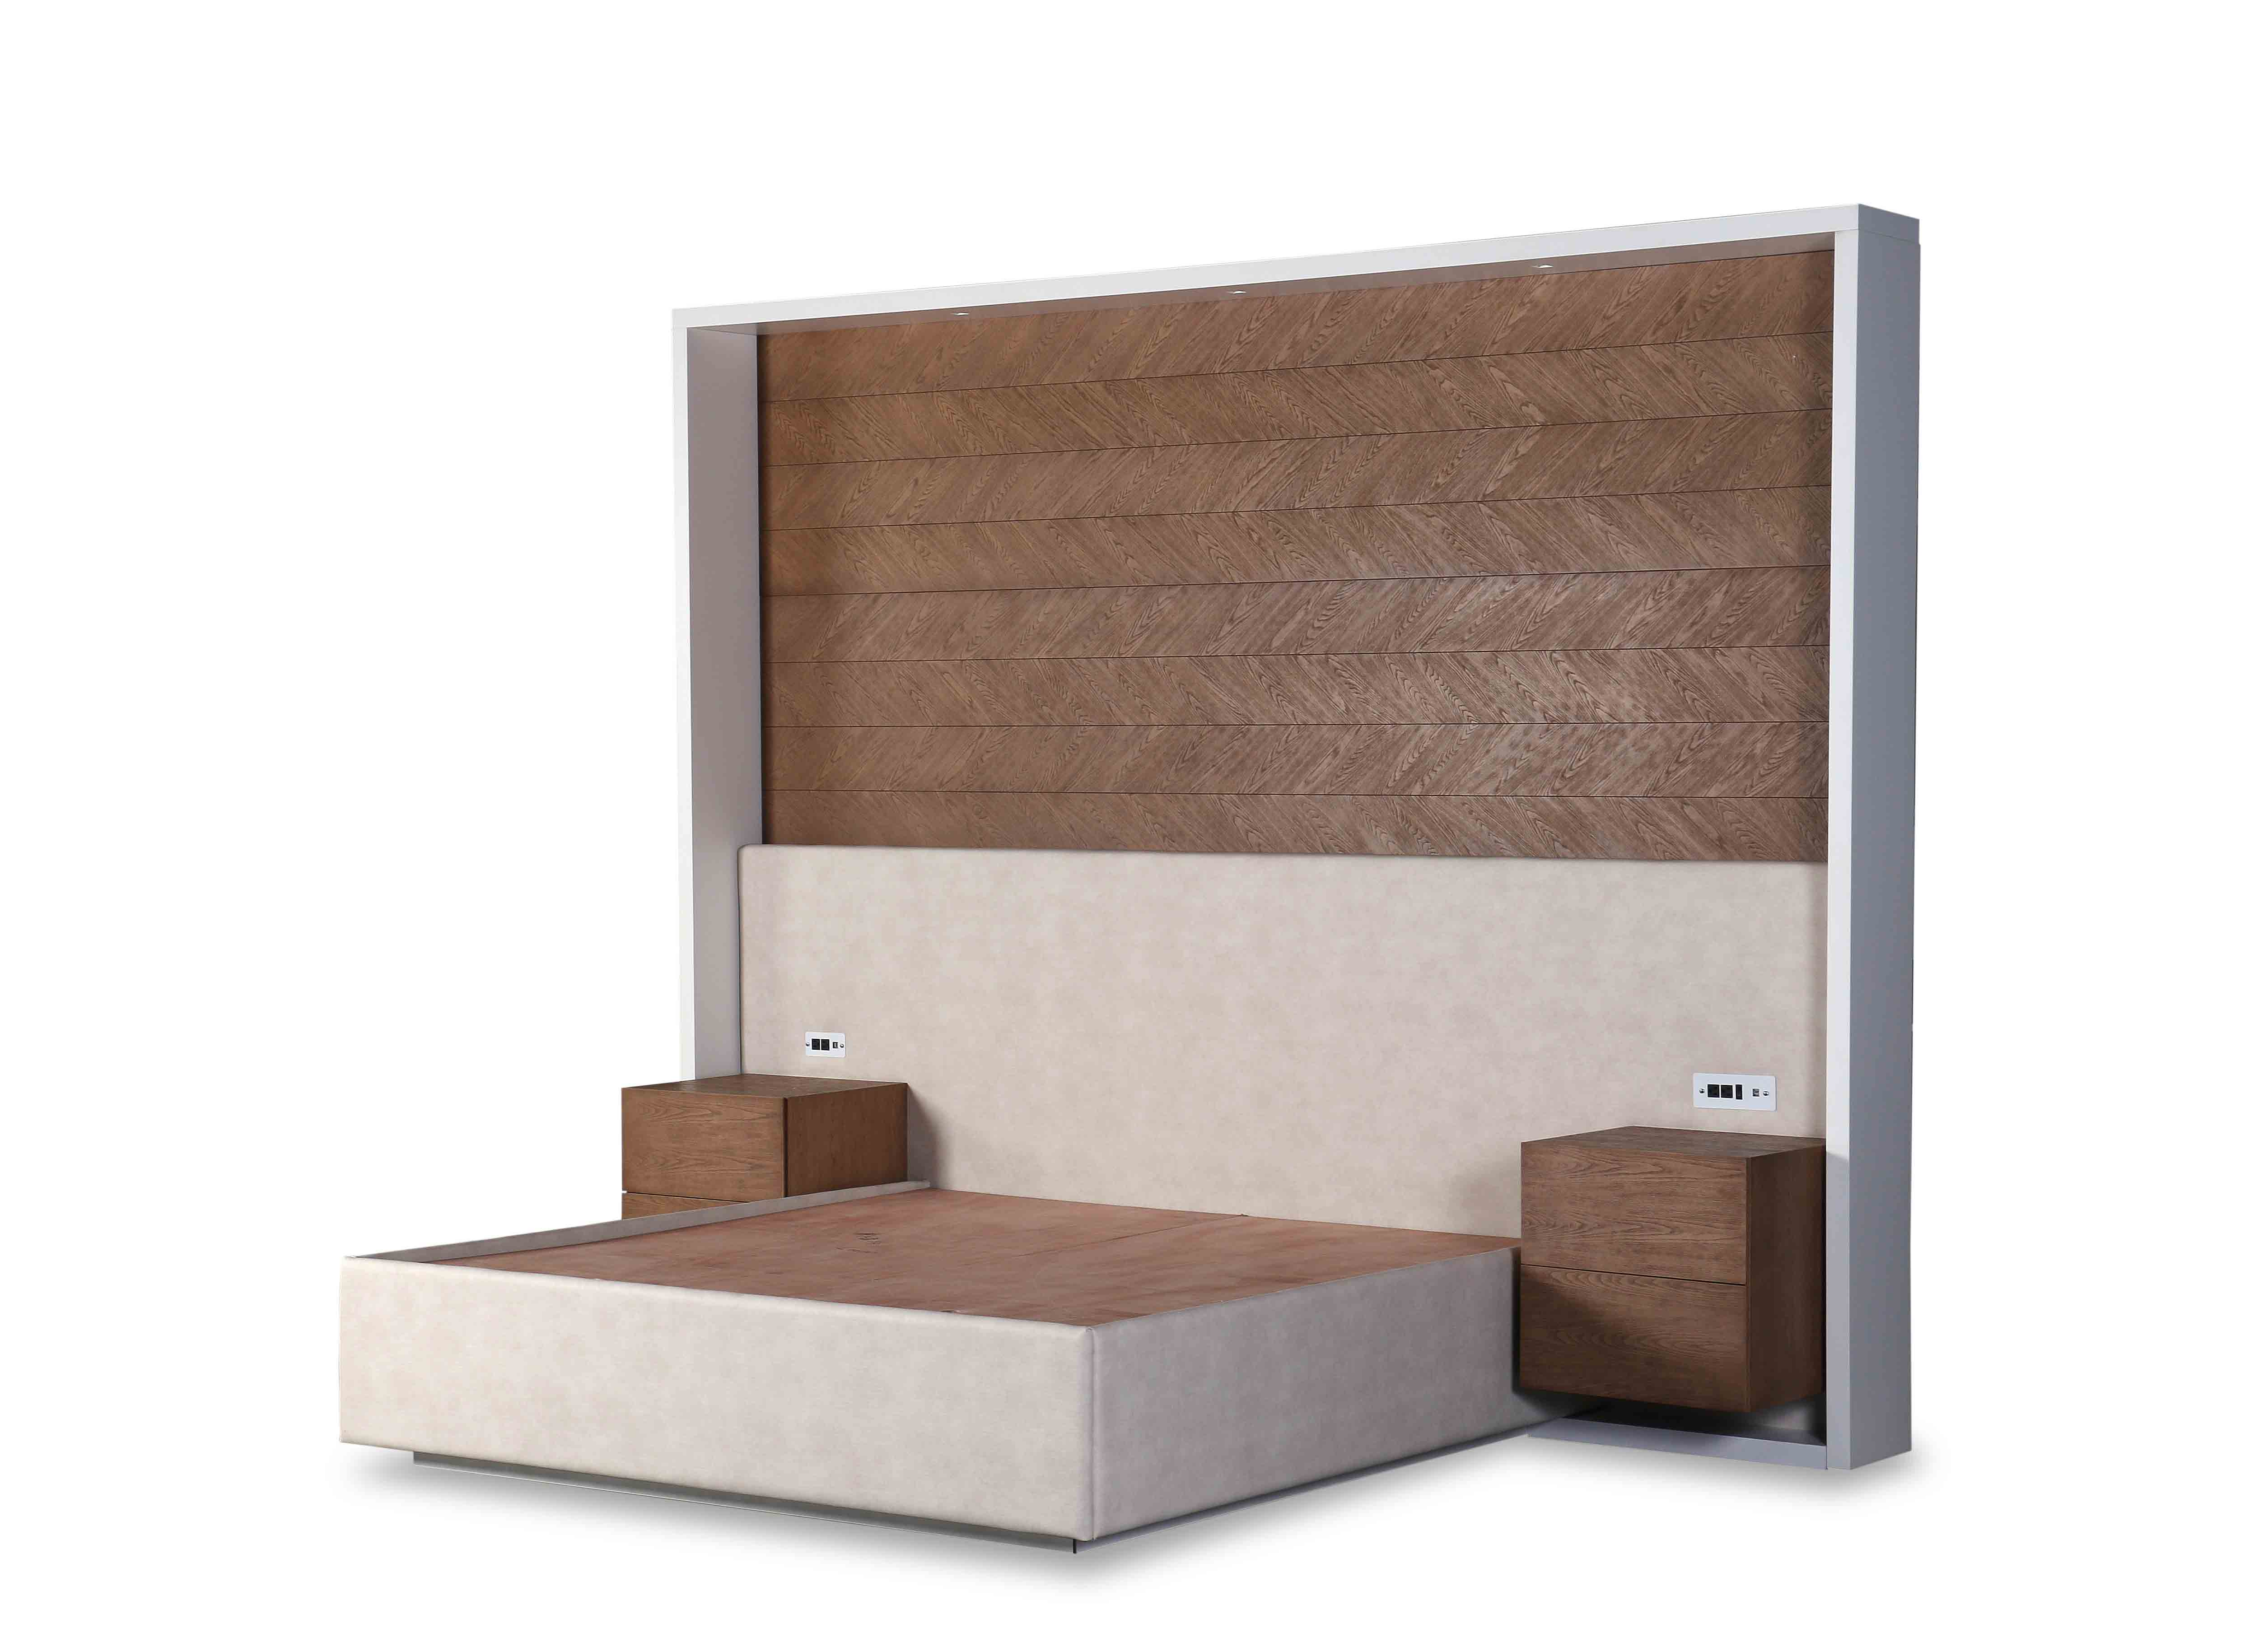 Headboard & Platform Bed BD-08